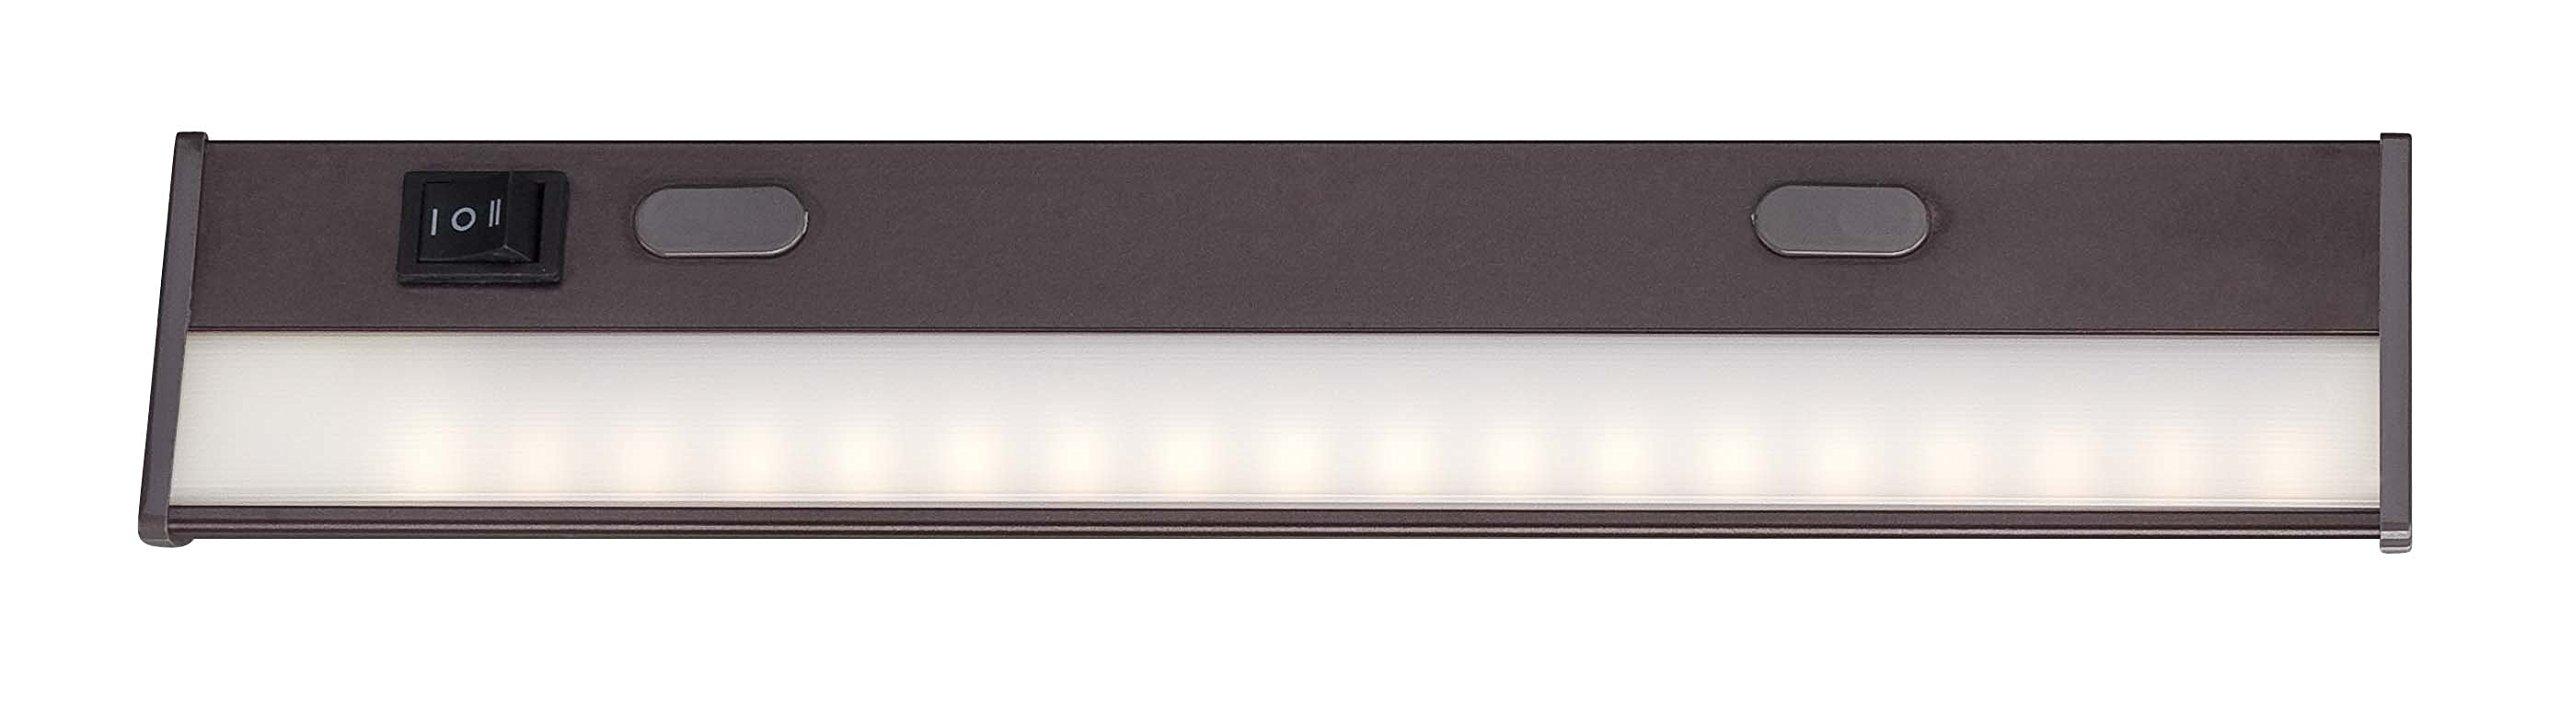 Acclaim Lighting LUC12BZ Do-It-Yourself LED Under Cabinet Lighting, 12'', Bronze